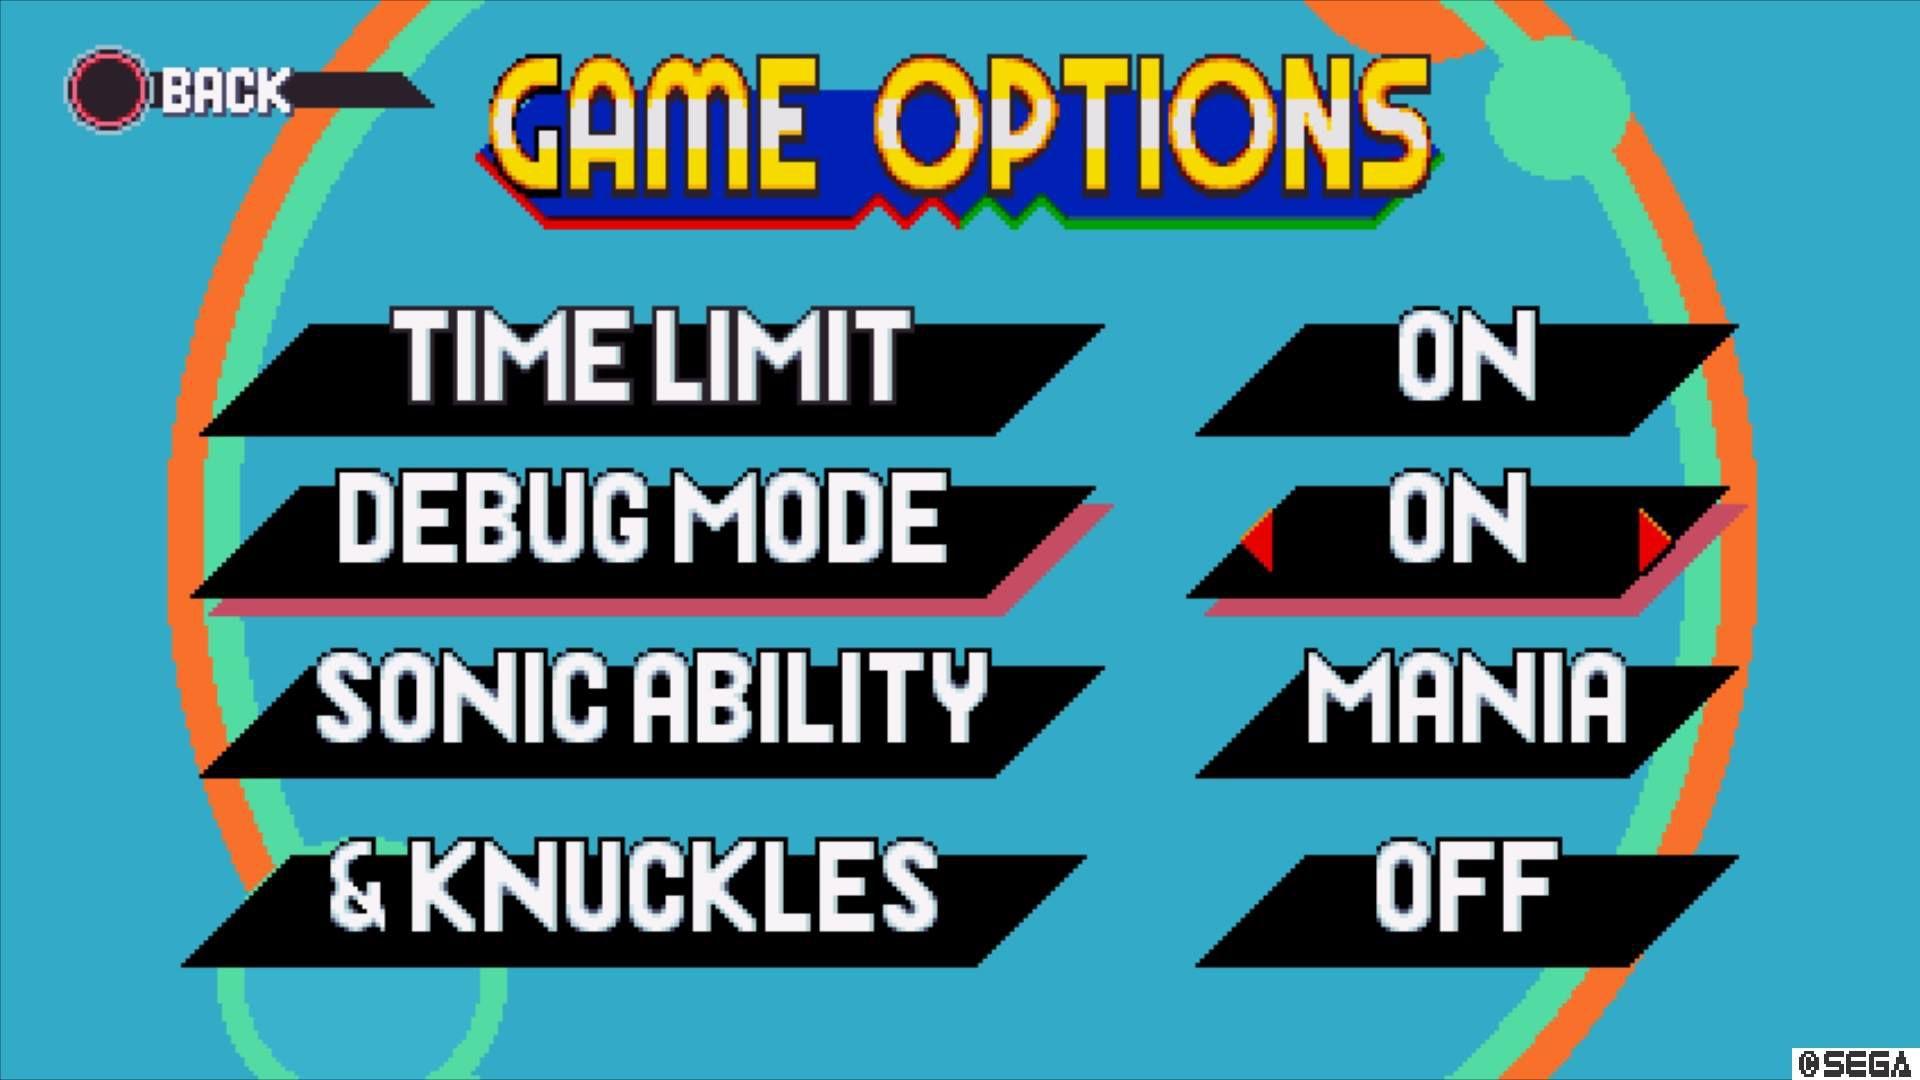 Press the game options button and enable Debug mode.